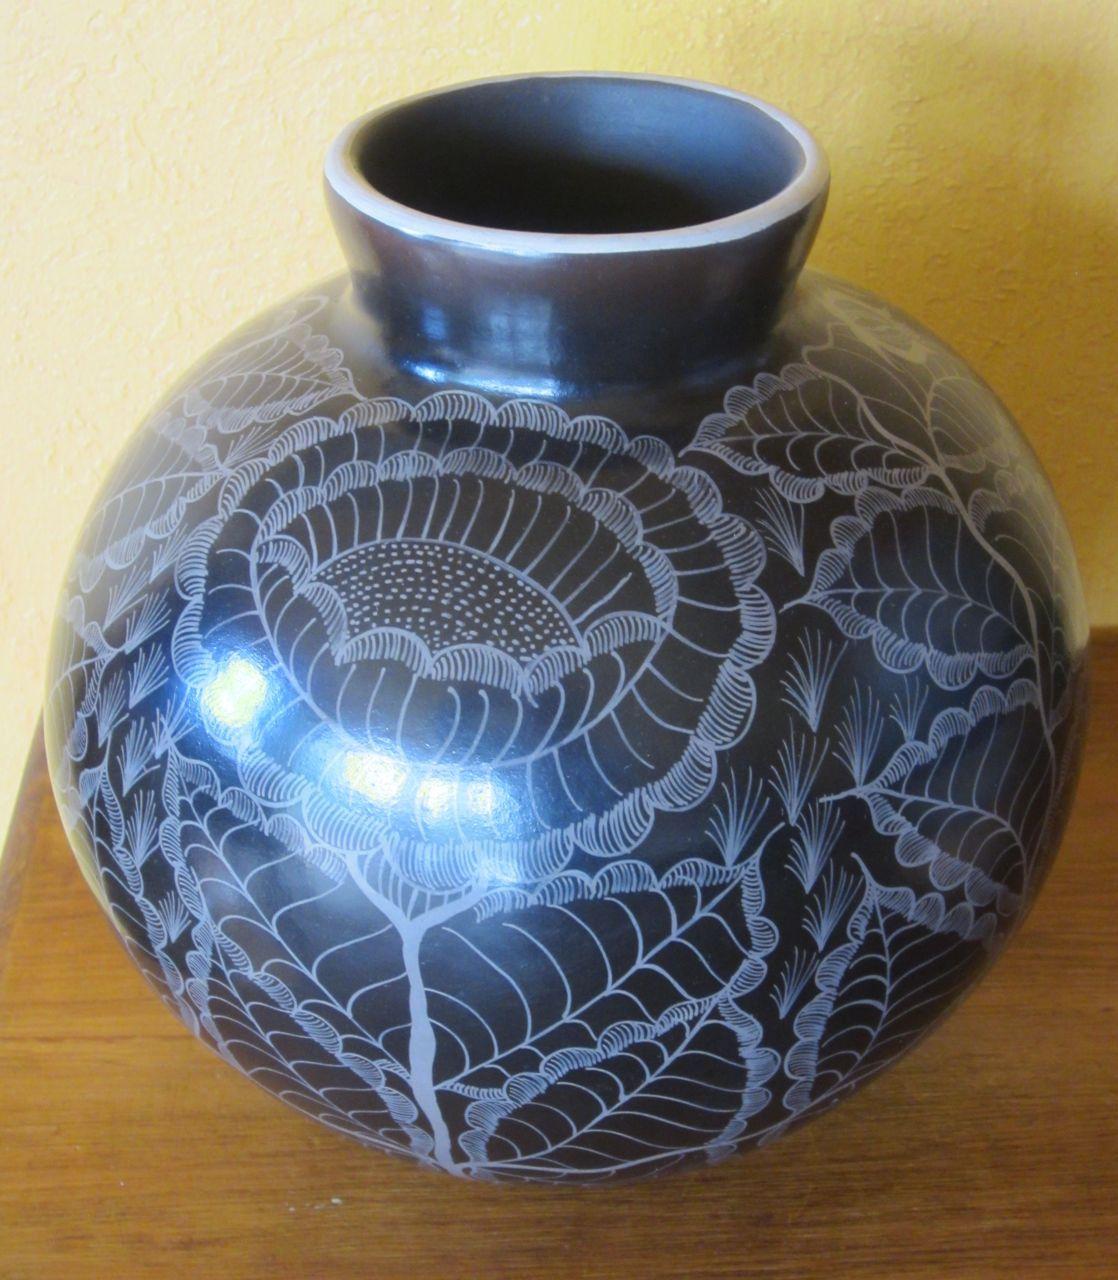 ✢ STYLE ✢ Viva México   Burnish pot from Huancito   Mexico By Heart